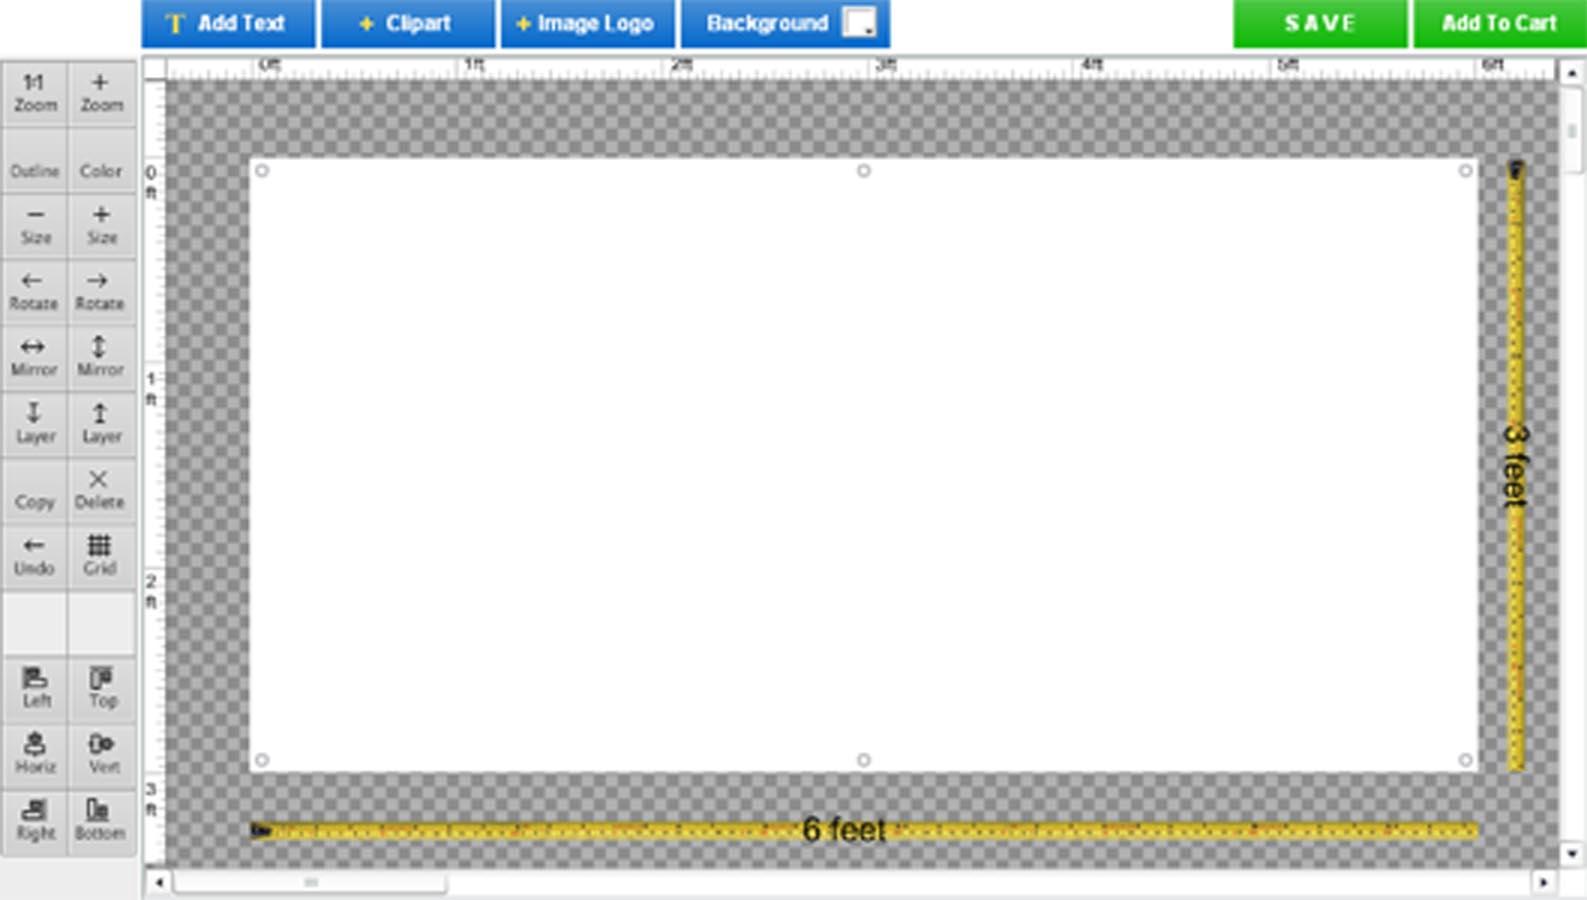 Blog designing vinyl banners online pt 1 - Text banner design ...